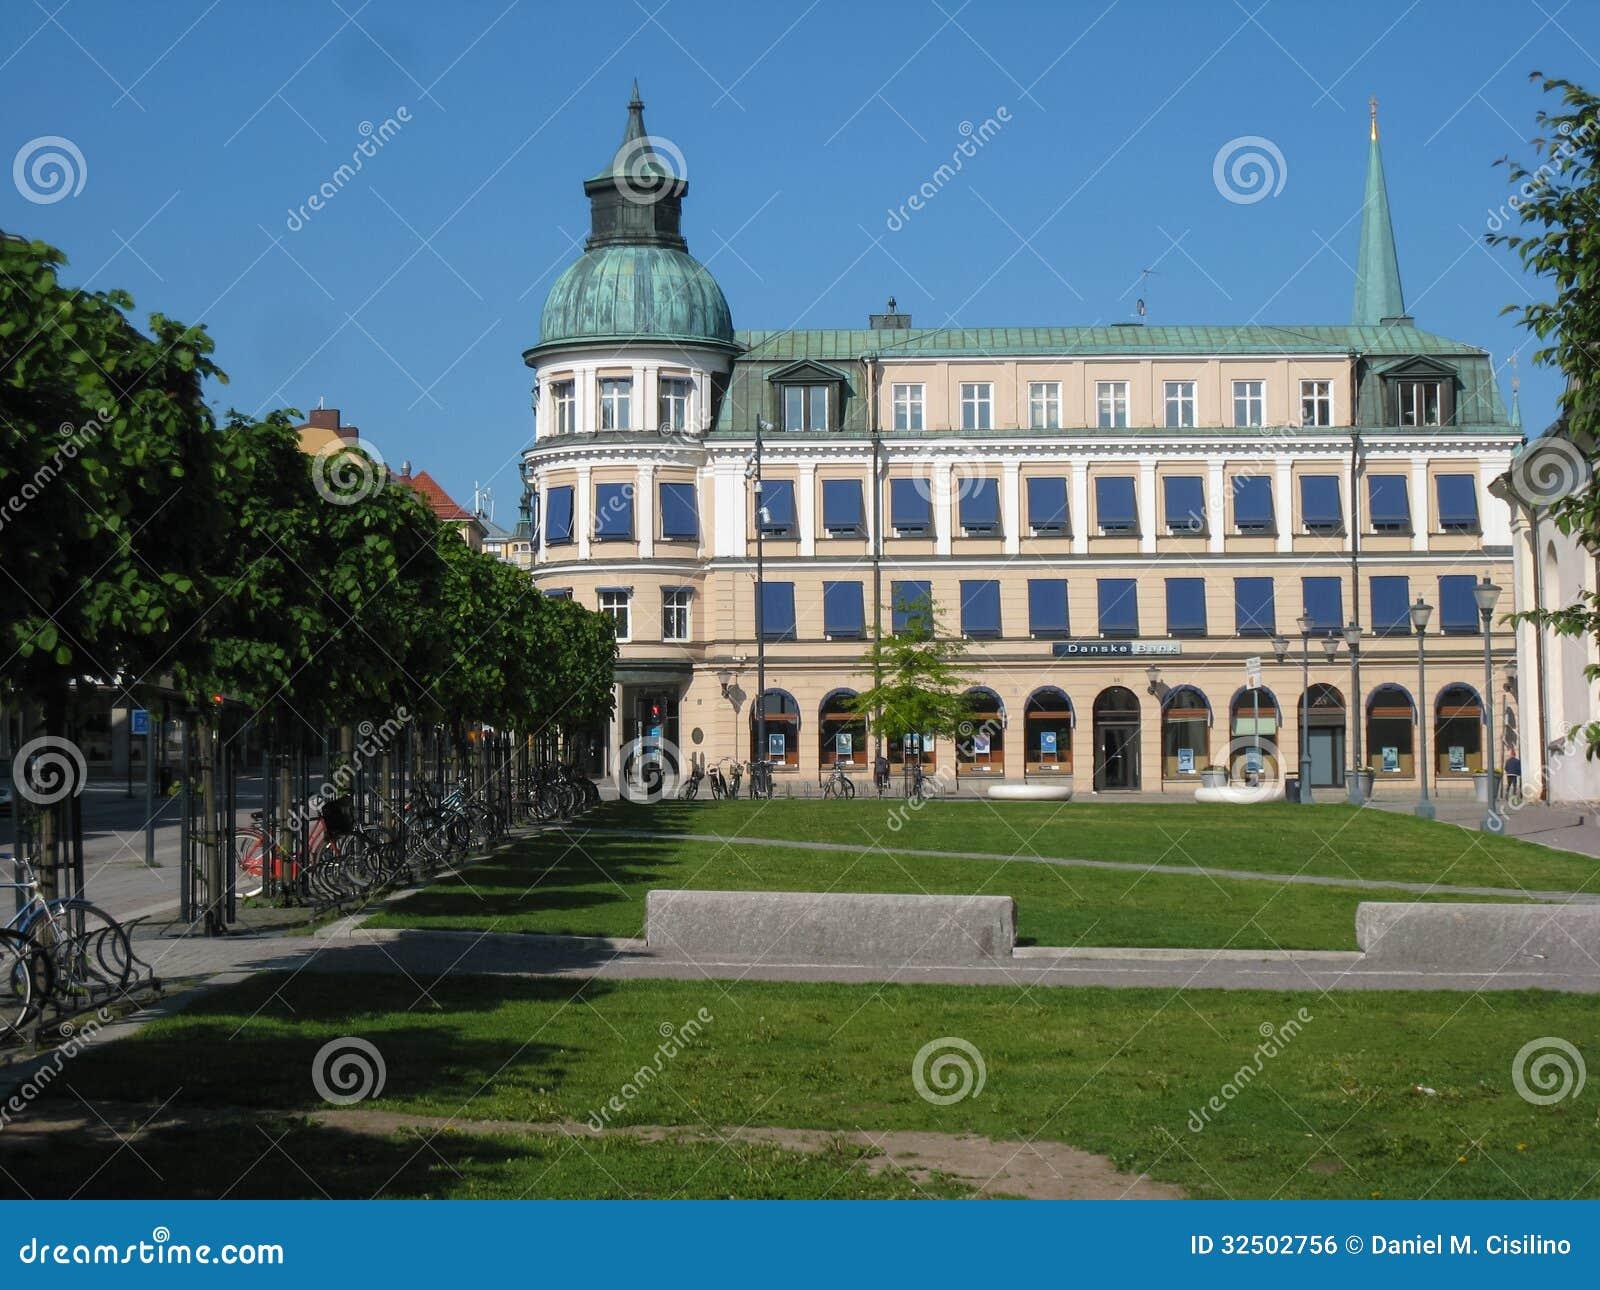 danske bank sweden